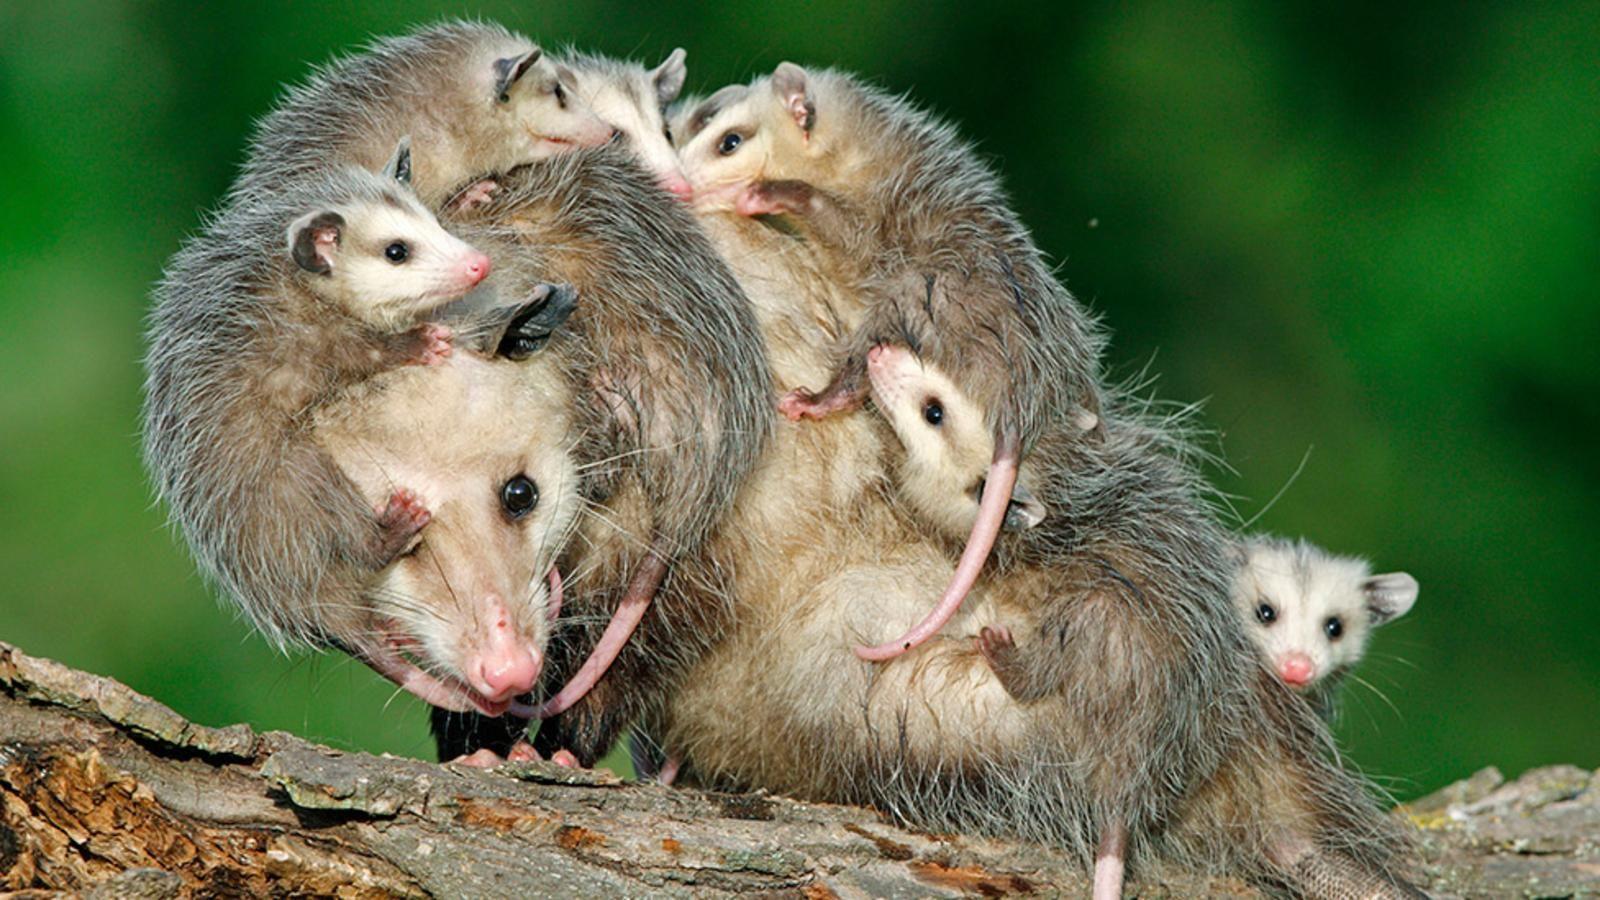 amazing mothers of the animal kingdom animal